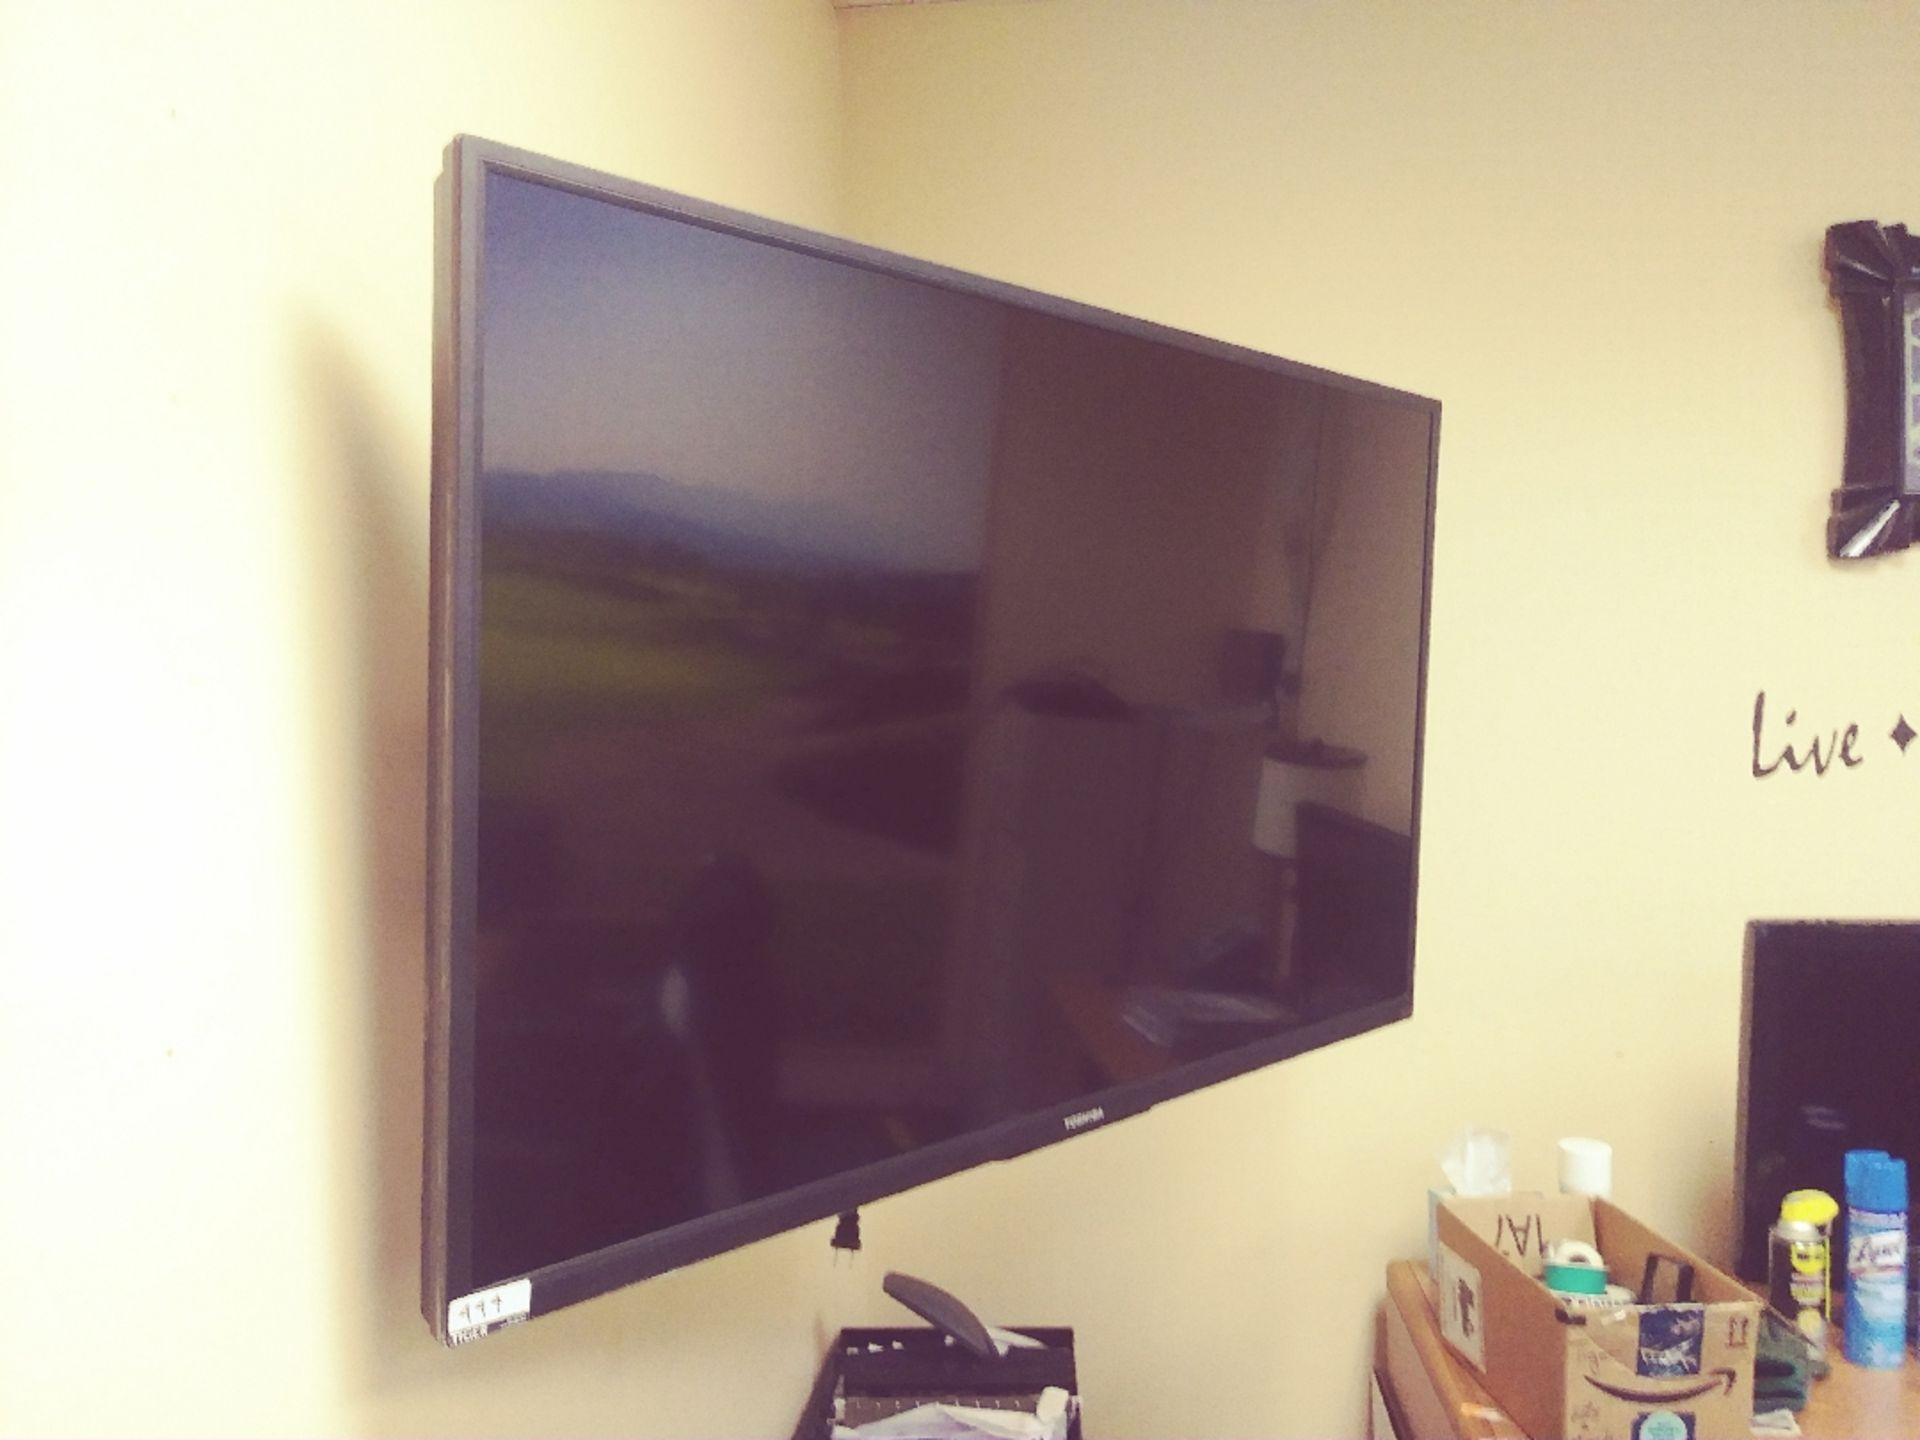 Toshiba 50in 4k Ultra HD TV